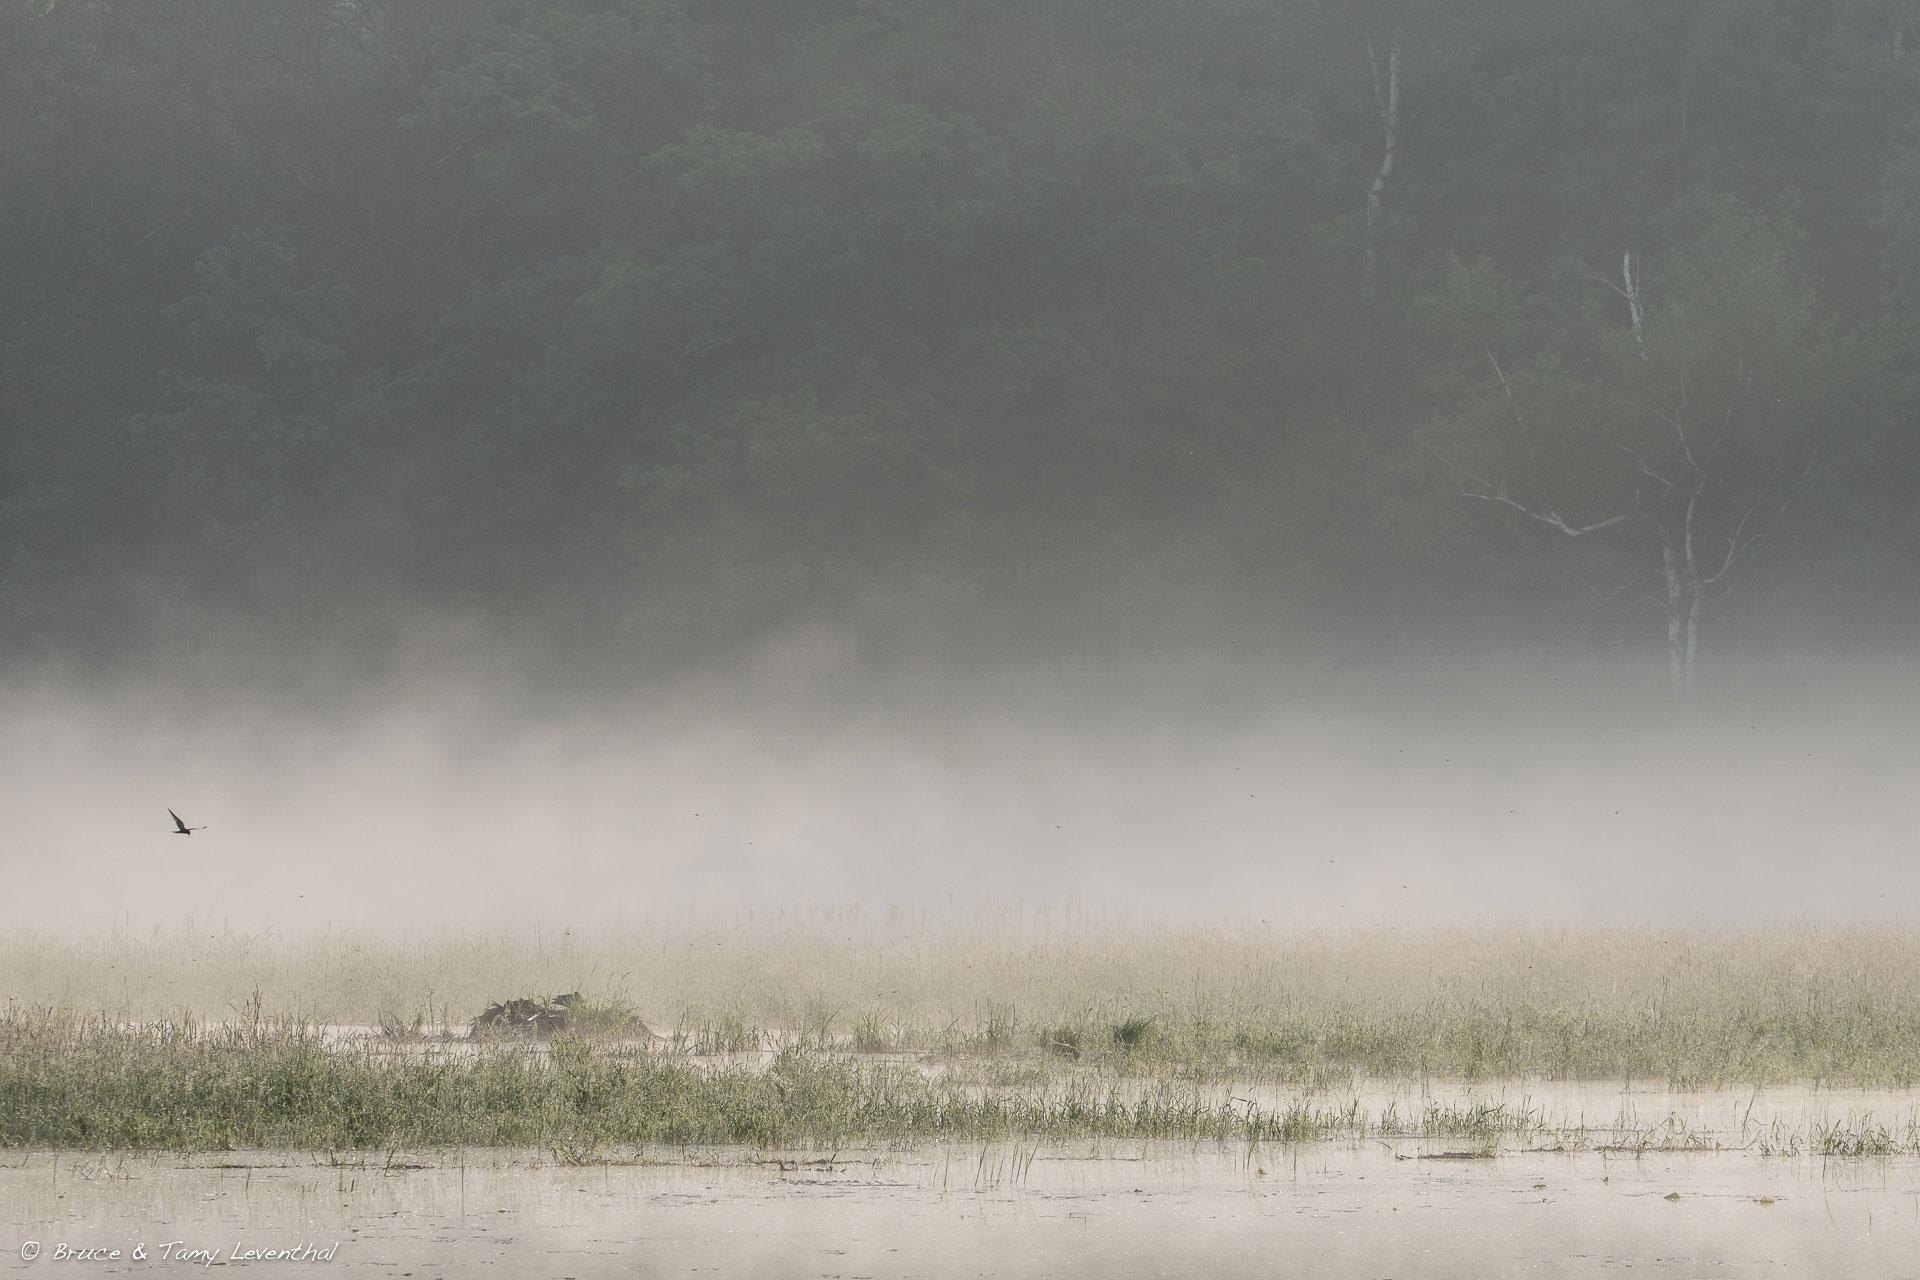 5/29/16 - Black Tern in Fog